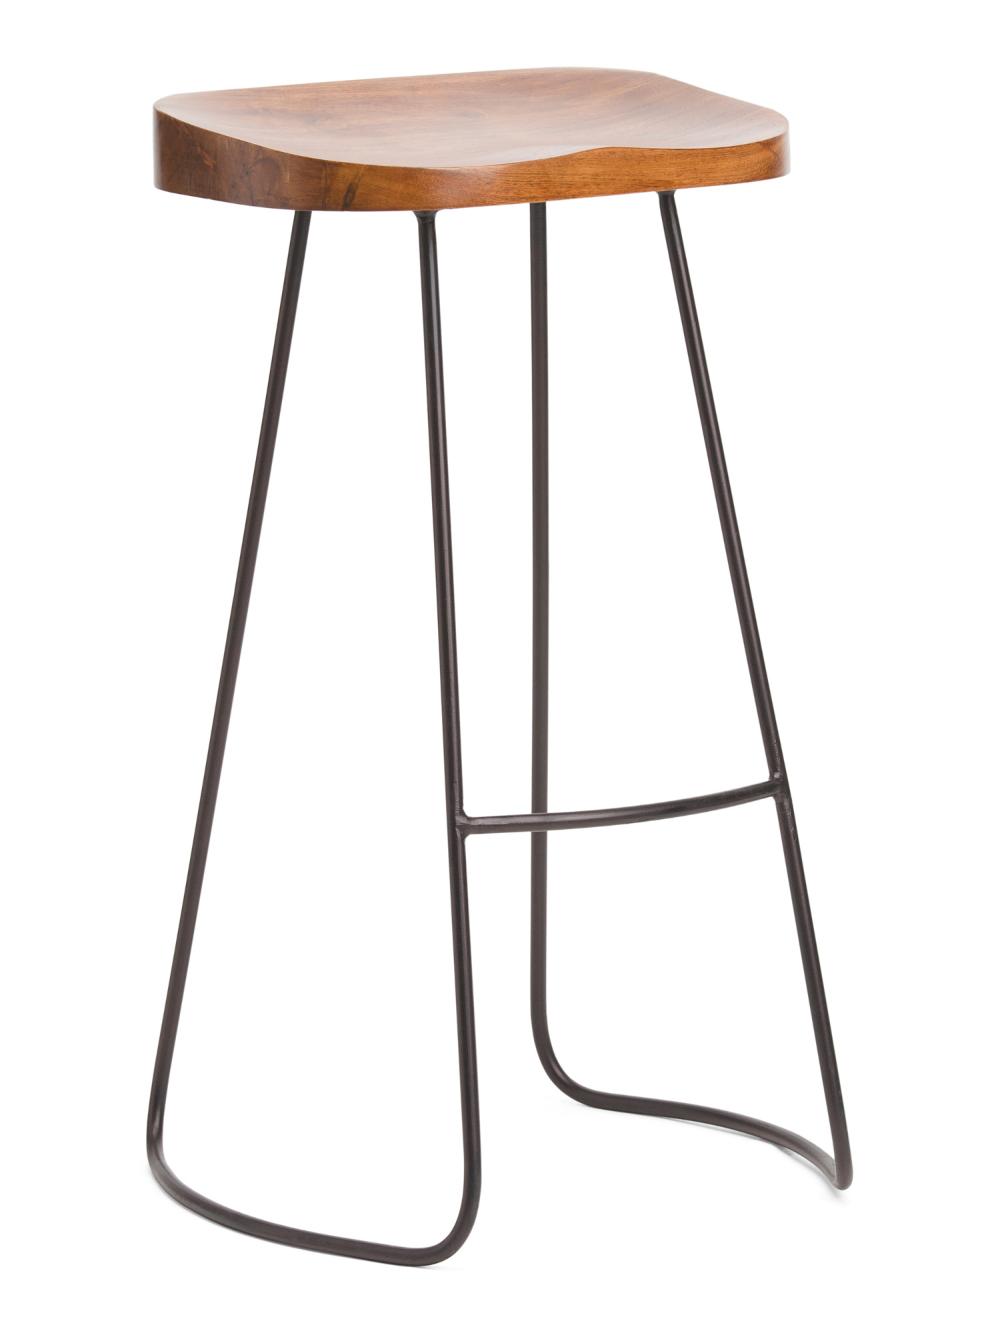 Mango Wood Boston Barstool Accent Furniture T J Maxx Wood Bar Stools Mango Wood Bar Stools